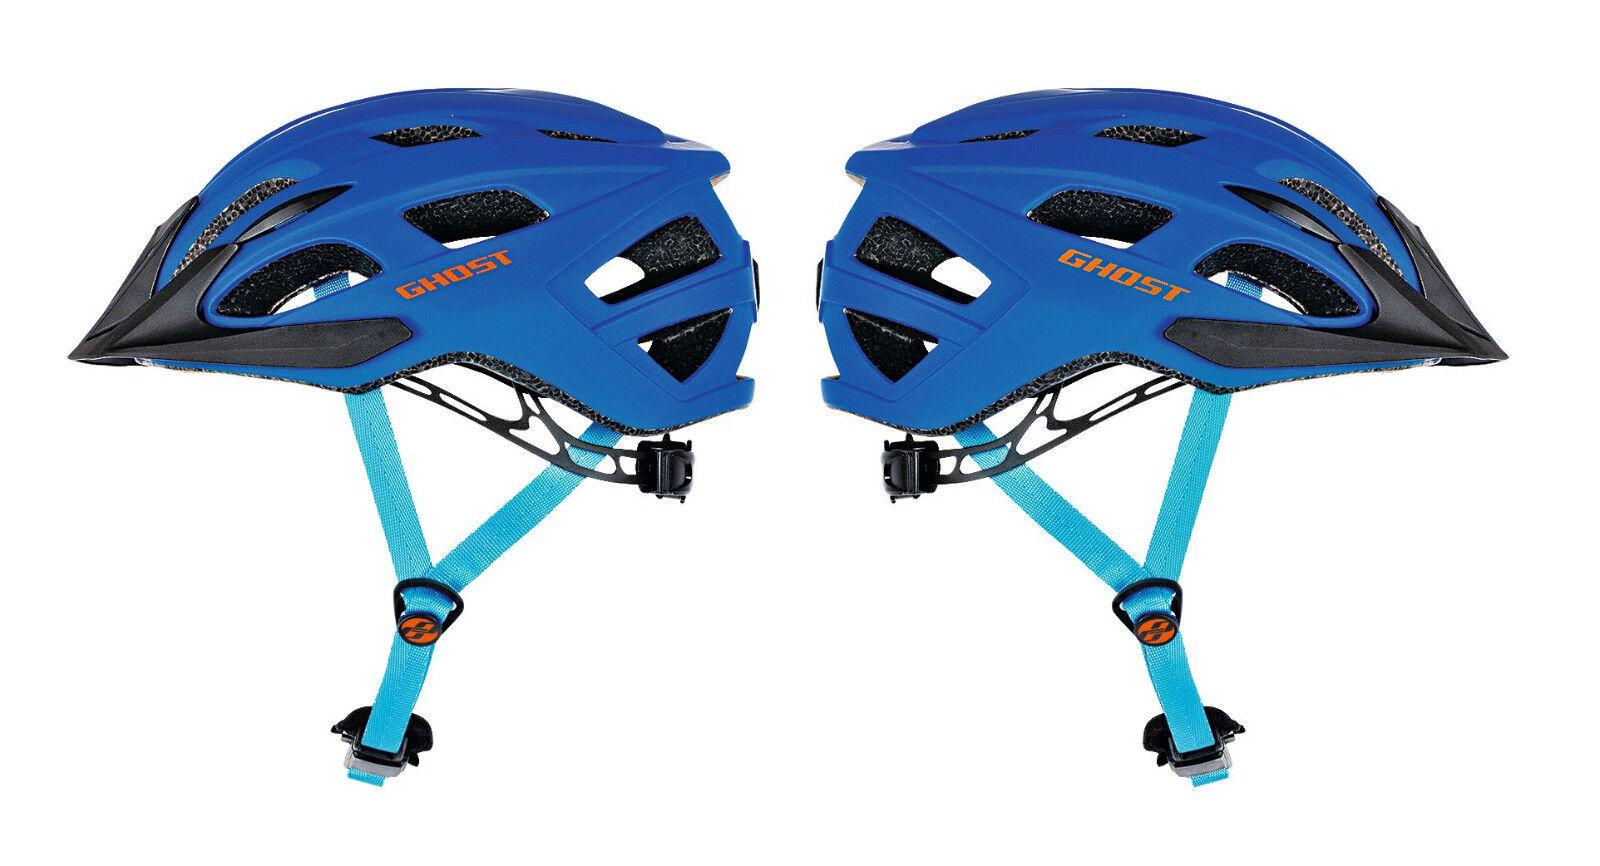 GHOST Bikes Fahrradhelm Helm Classic blue orange Modell 2017 Größe 53-58cm